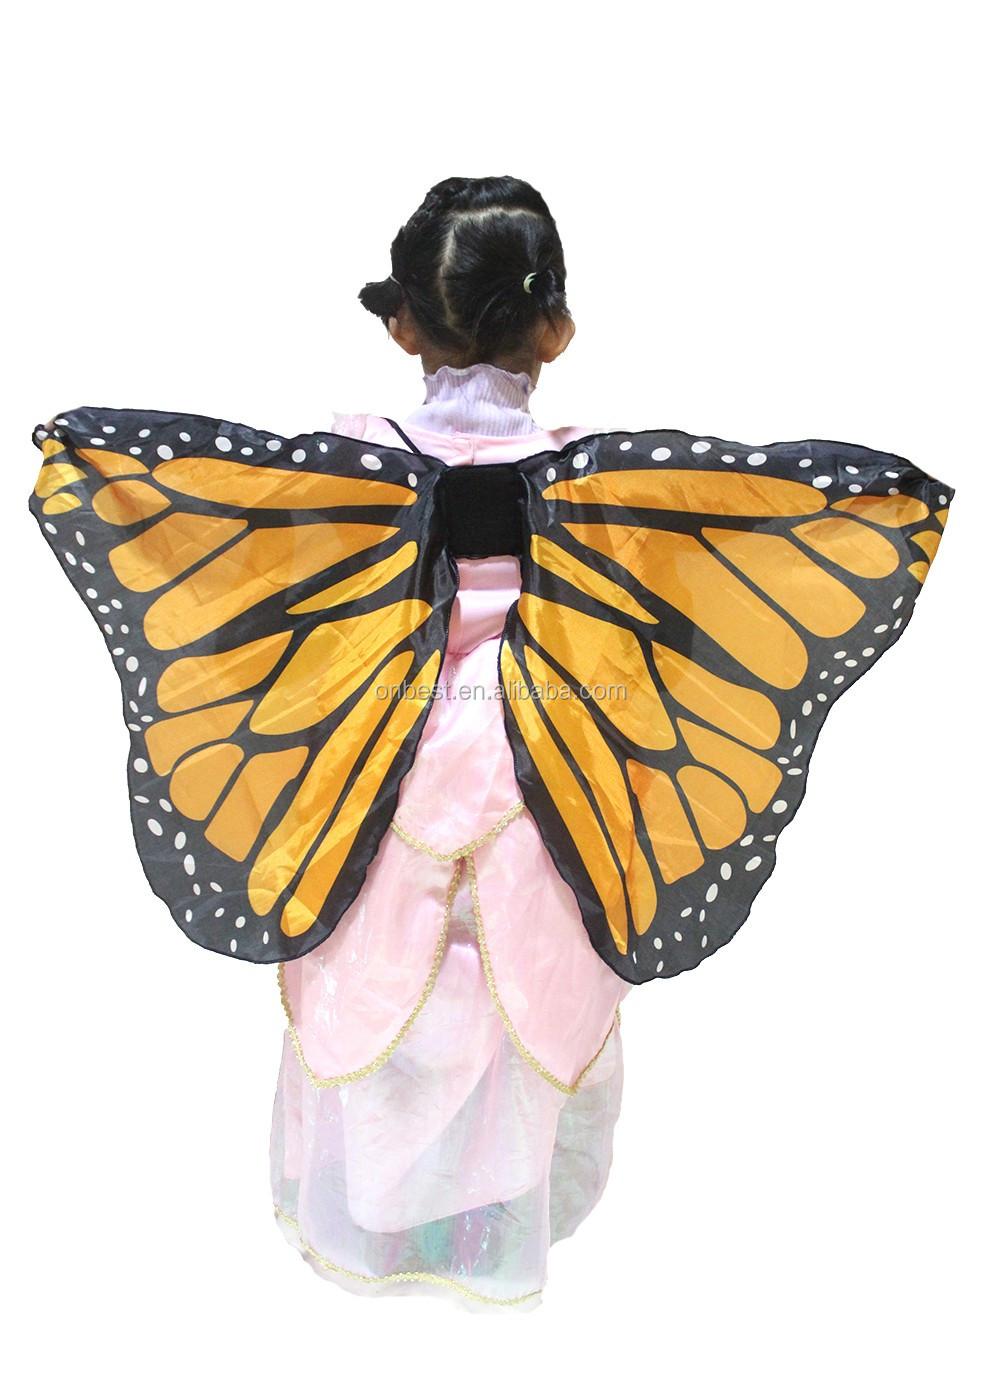 Sayap Kupu Kupu : sayap, Onbest, Populer, Murah, Sayap, Kupu-kupu, Butterfly, Cape,Kupu-kupu, Untuk, Anak-anak,Pink, Product, Alibaba.com